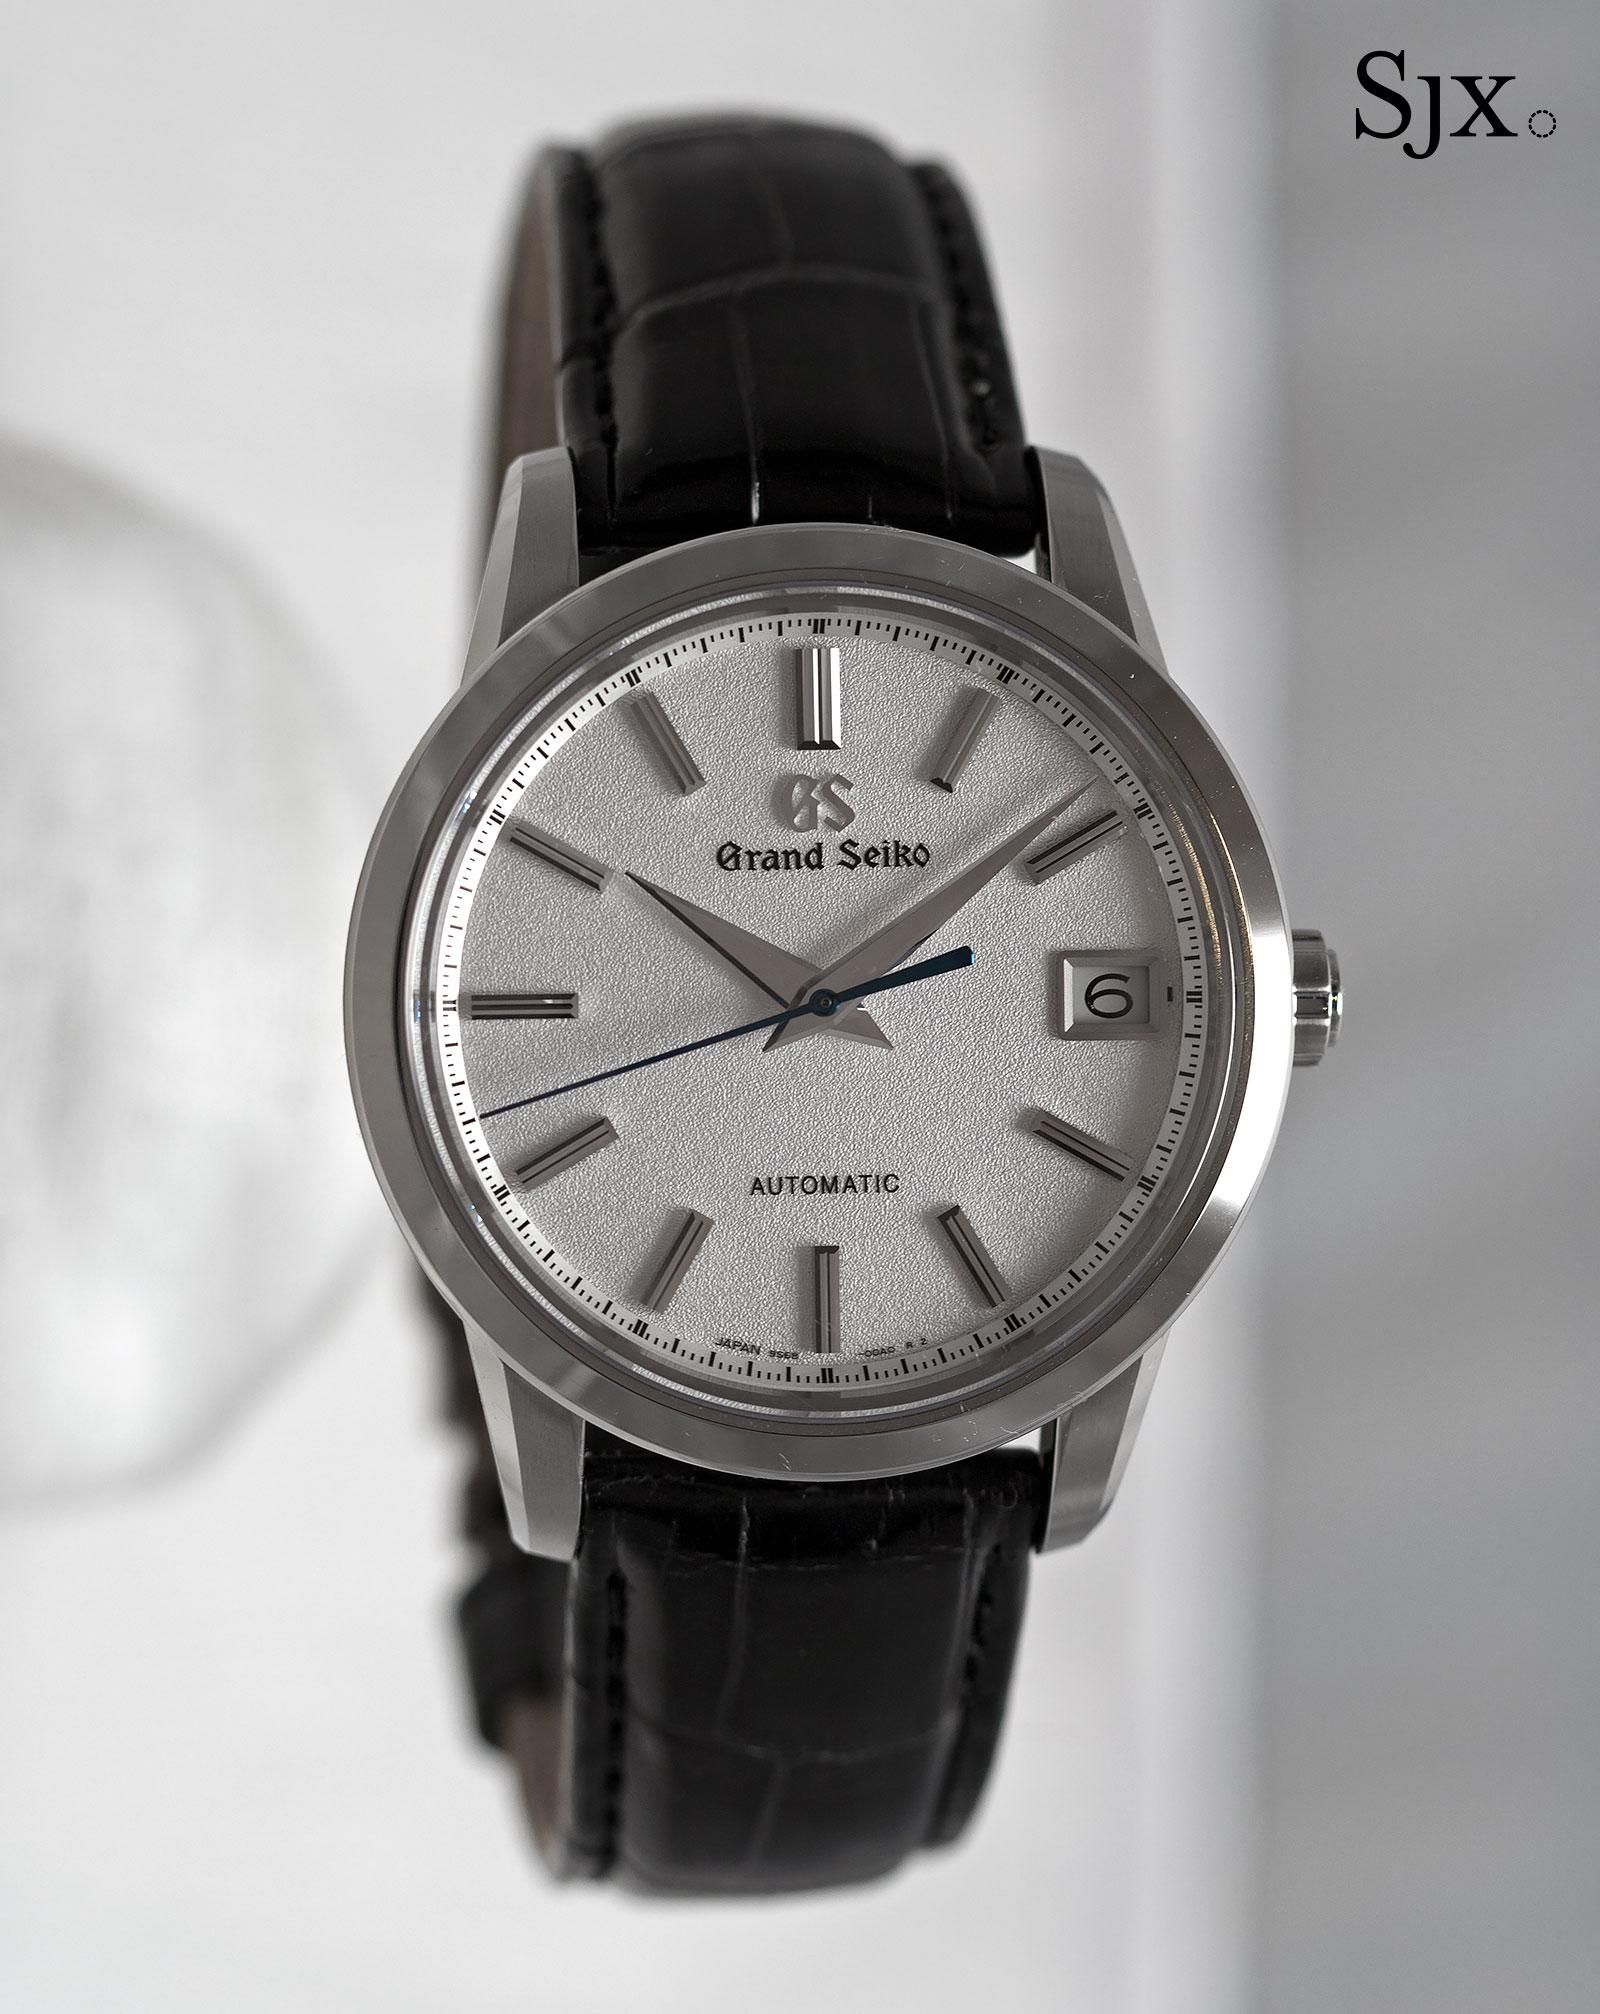 Grand Seiko SBGR305 titanium 2